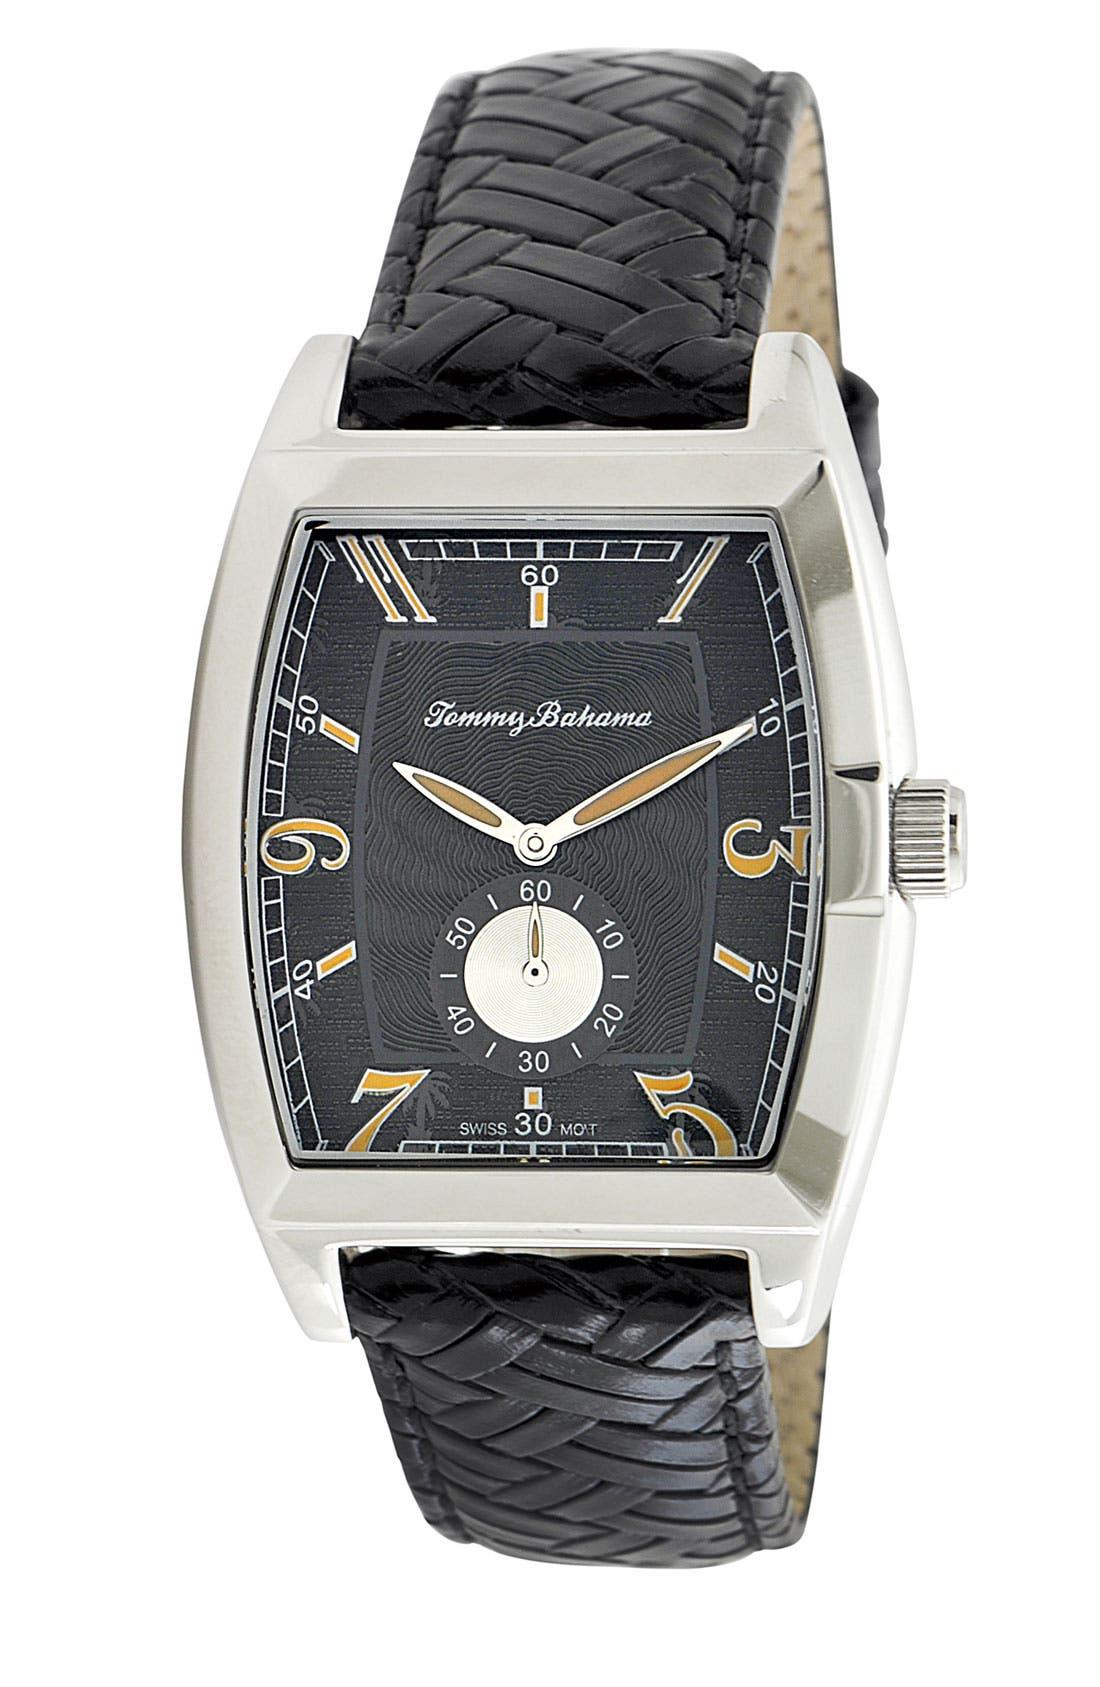 Main Image - Tommy Bahama 'Islander' Braided Leather Strap Watch, 36mm x 50mm